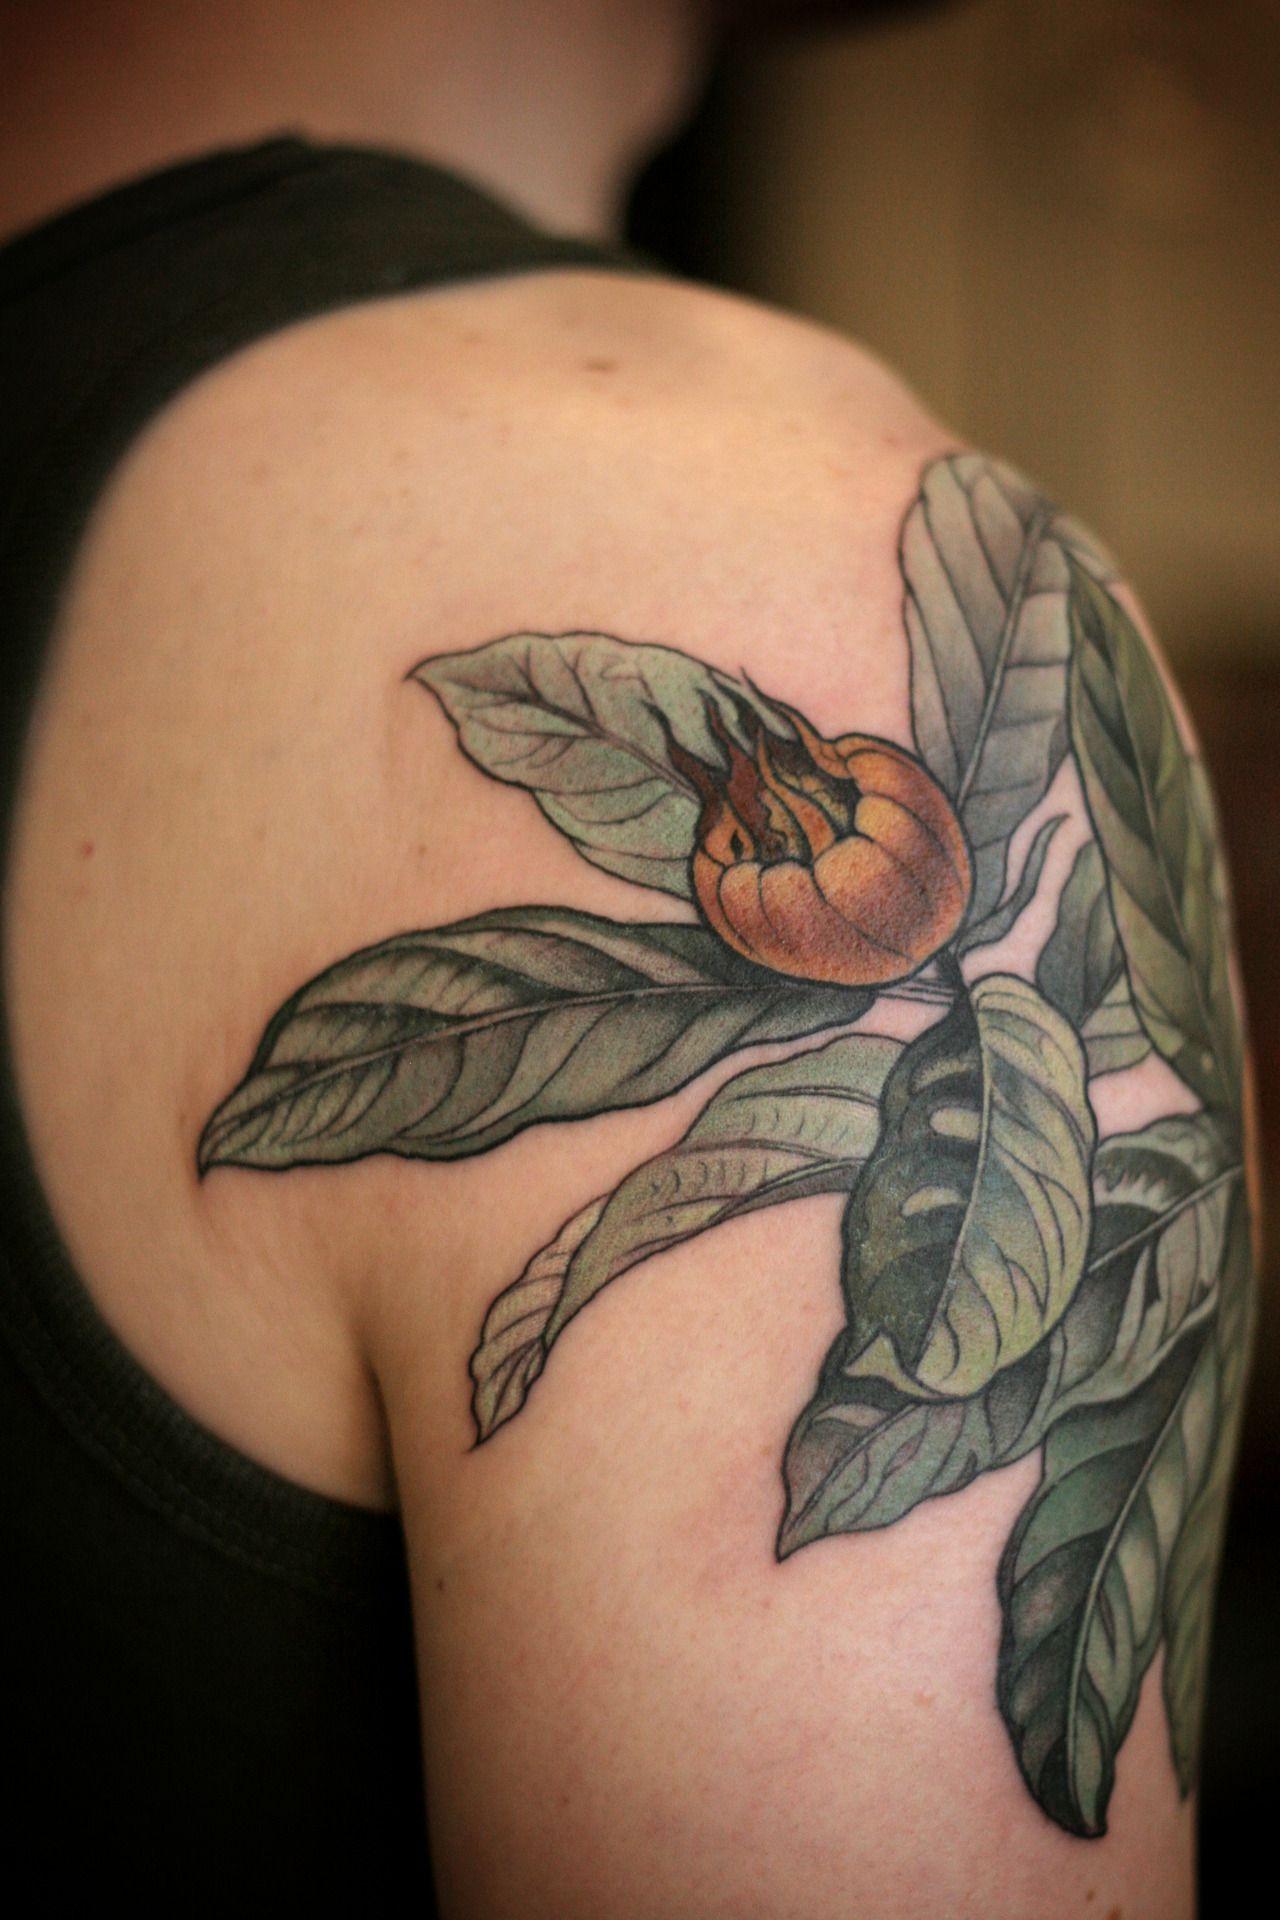 Botanical Illustration Of Medlar Fruit Done By Alice Kendall Wonderland Tattoo In Portland Oregon Botanical Illustration Tattoo Wonderland Tattoo Tattoos